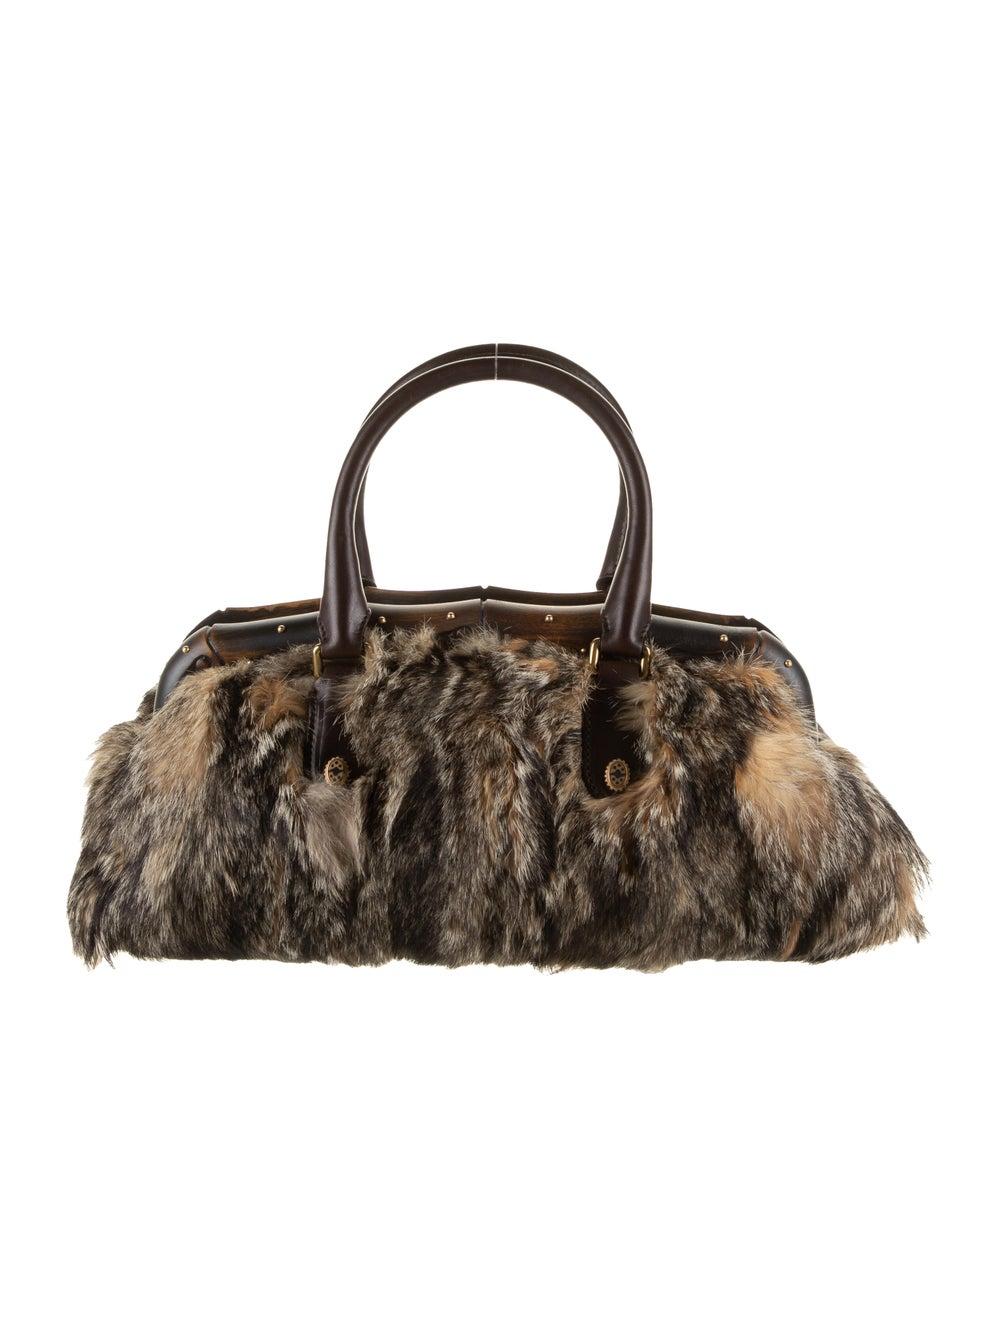 Gucci Fur Bamboo Frame Handle Bag Gold - image 4